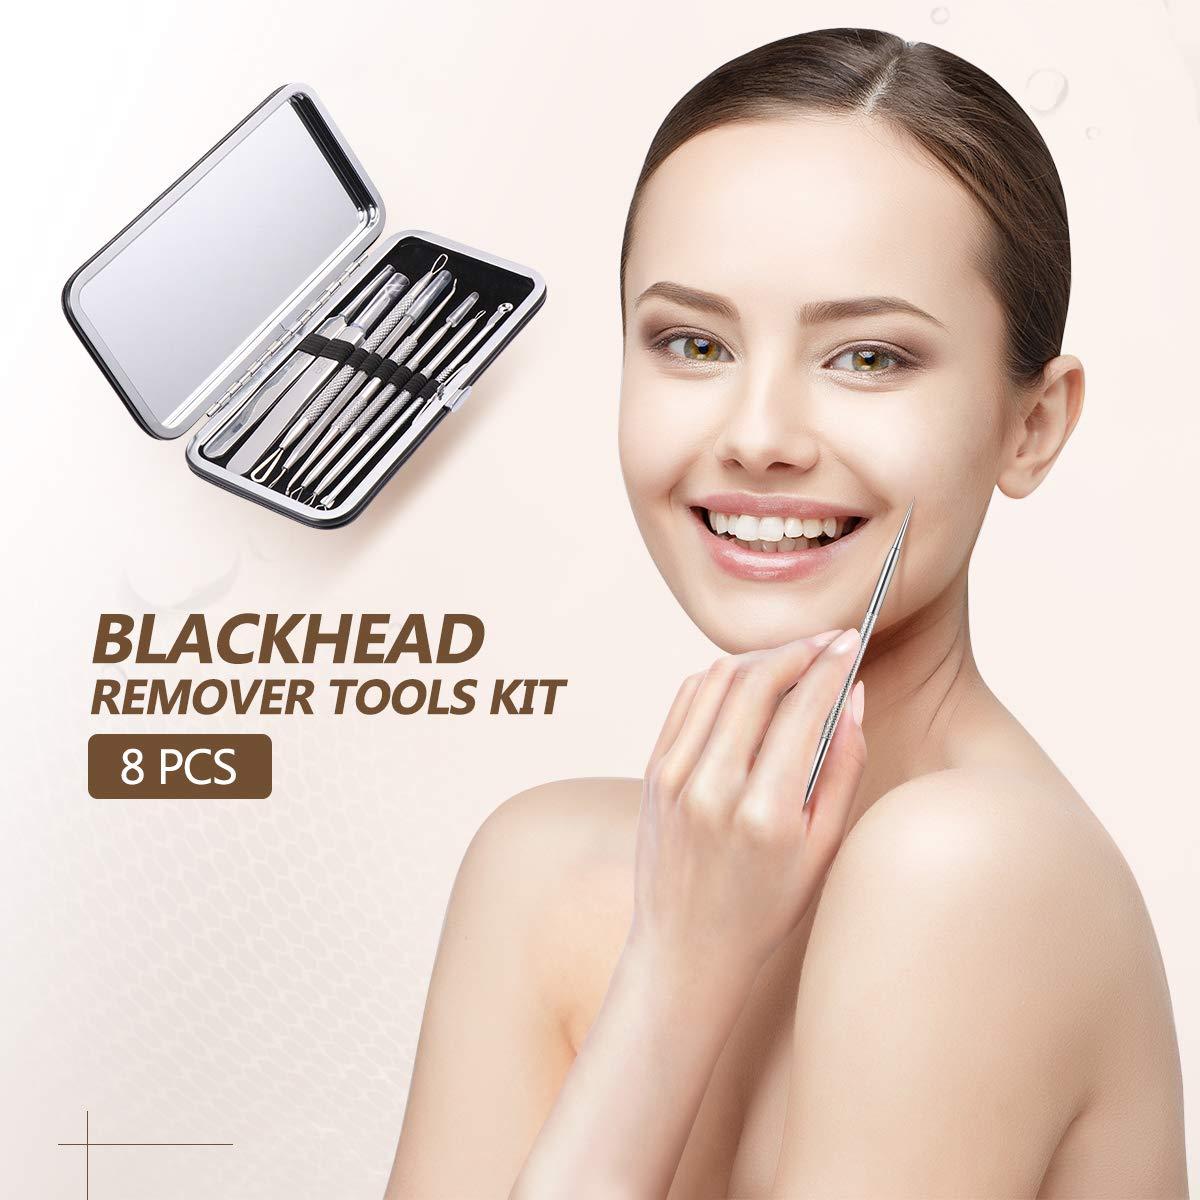 Blackhead Remover Tool Pore Extractor Tool, Professional Blackhead Extractor Acne Removal Tweezer Kit